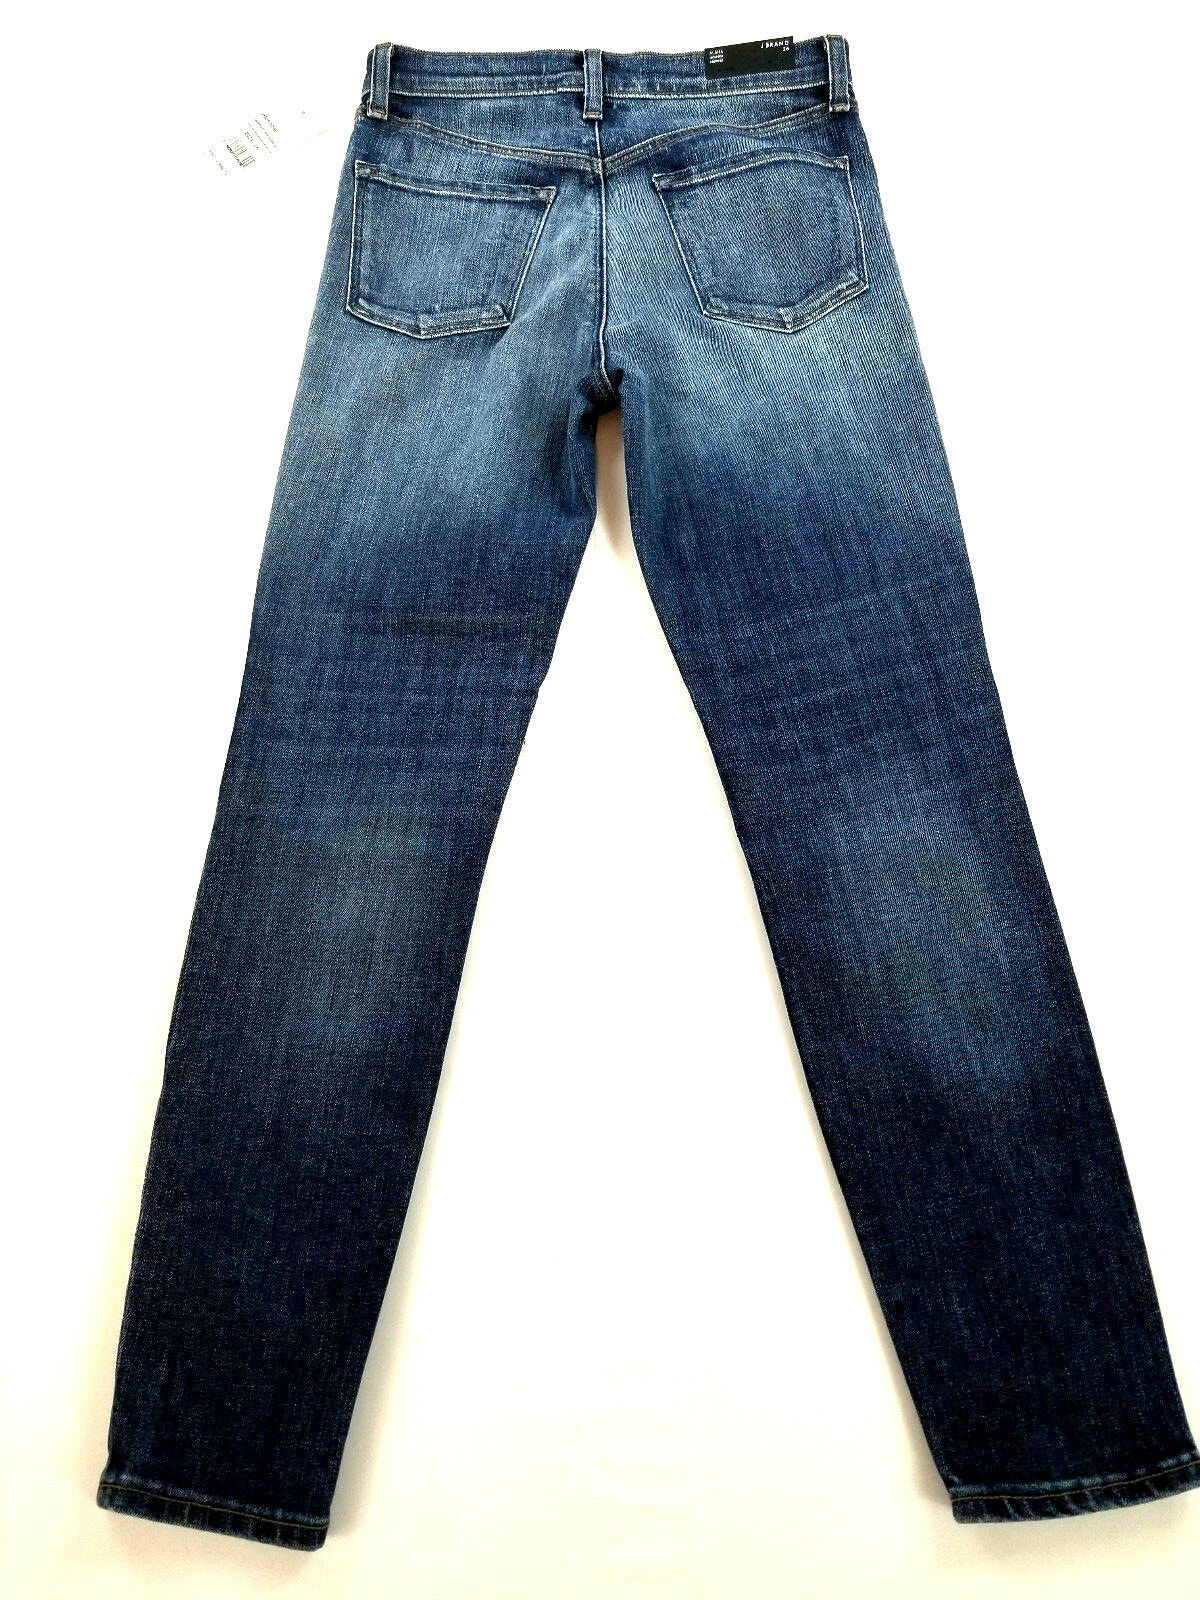 new J BRAND women jeans Jasper Patched JB001098 high rise crop 26 blue MSRP $298 image 6